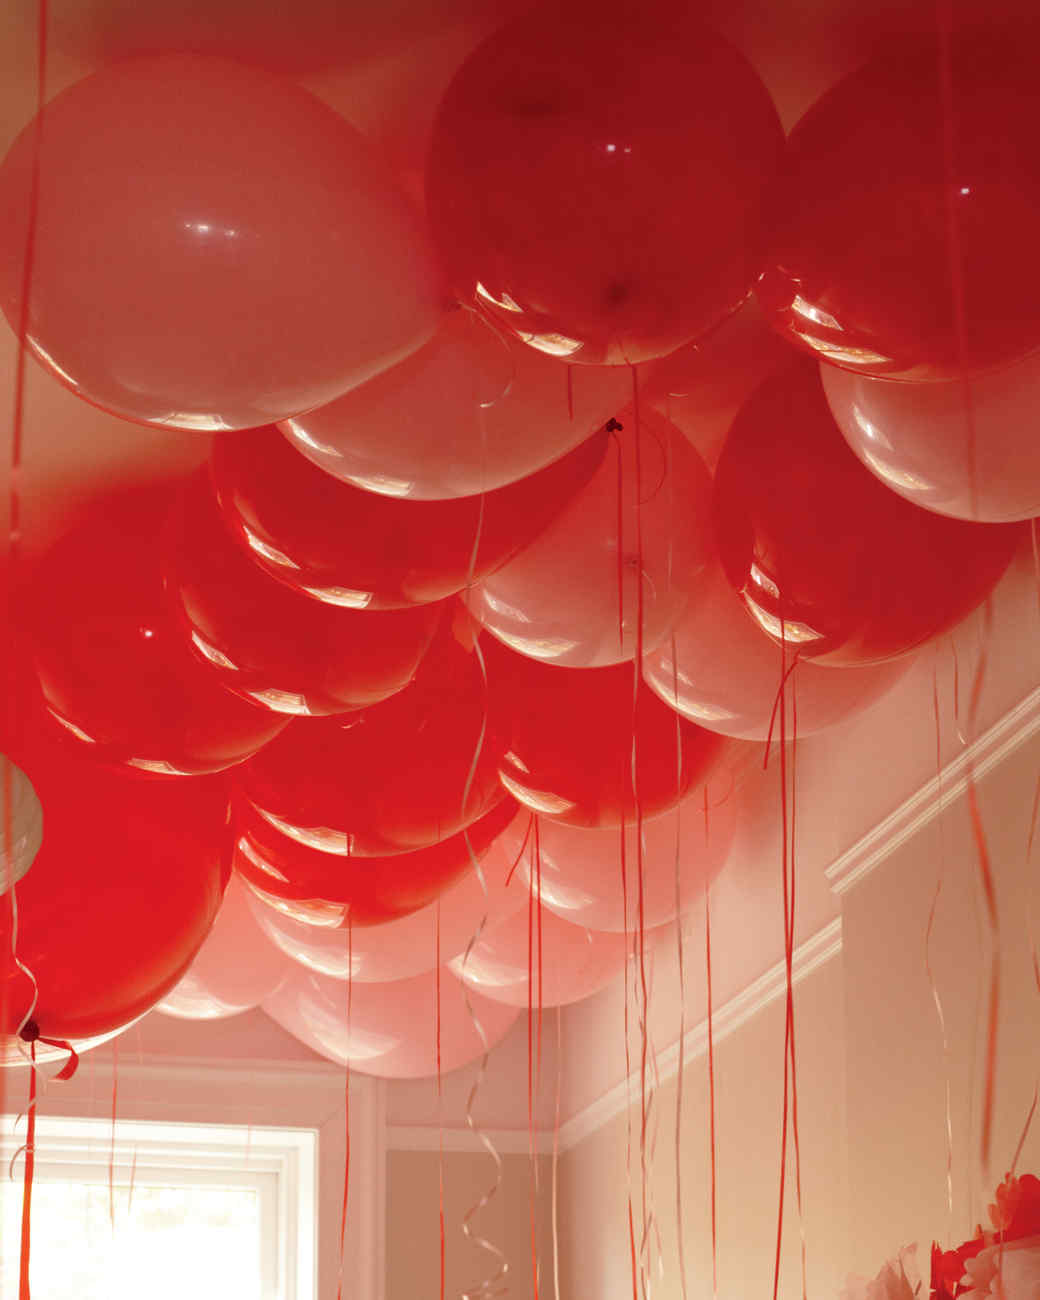 balloons-mld108152.jpg